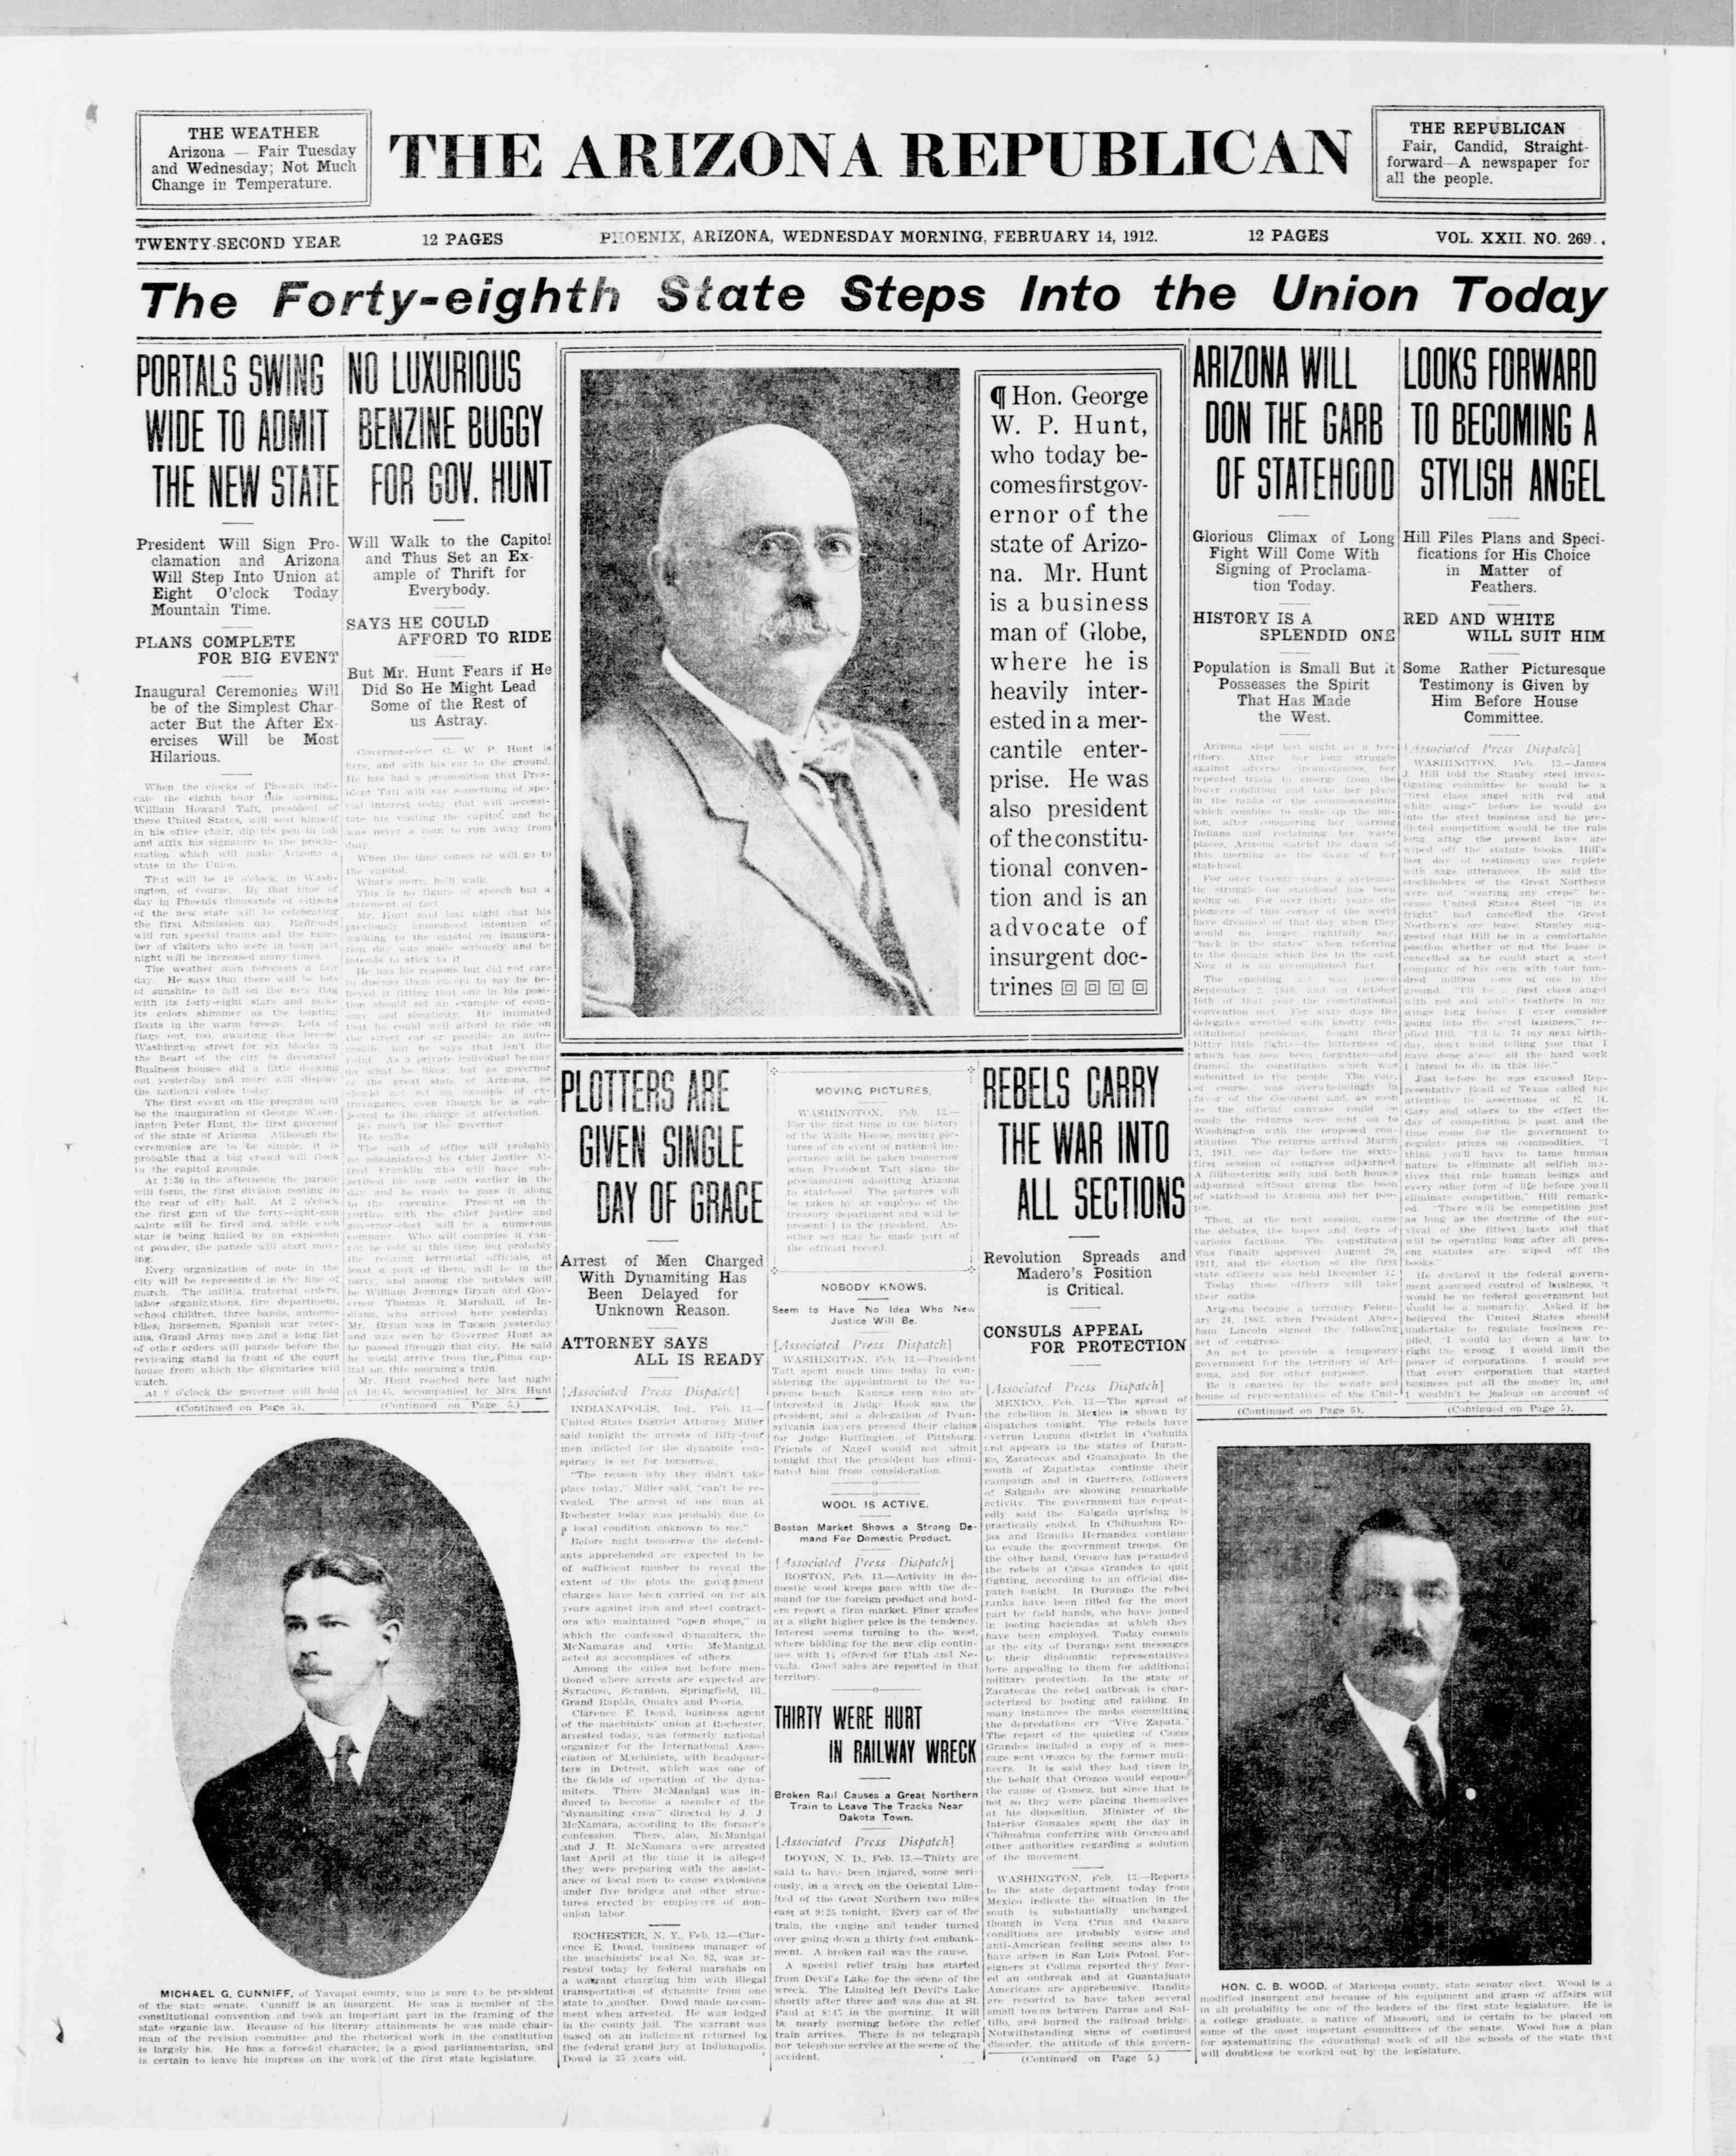 Arizona Republican. (Phoenix, Ariz.), Feb. 14, 1912. Front page news: Admission the state of Arizona to the union.